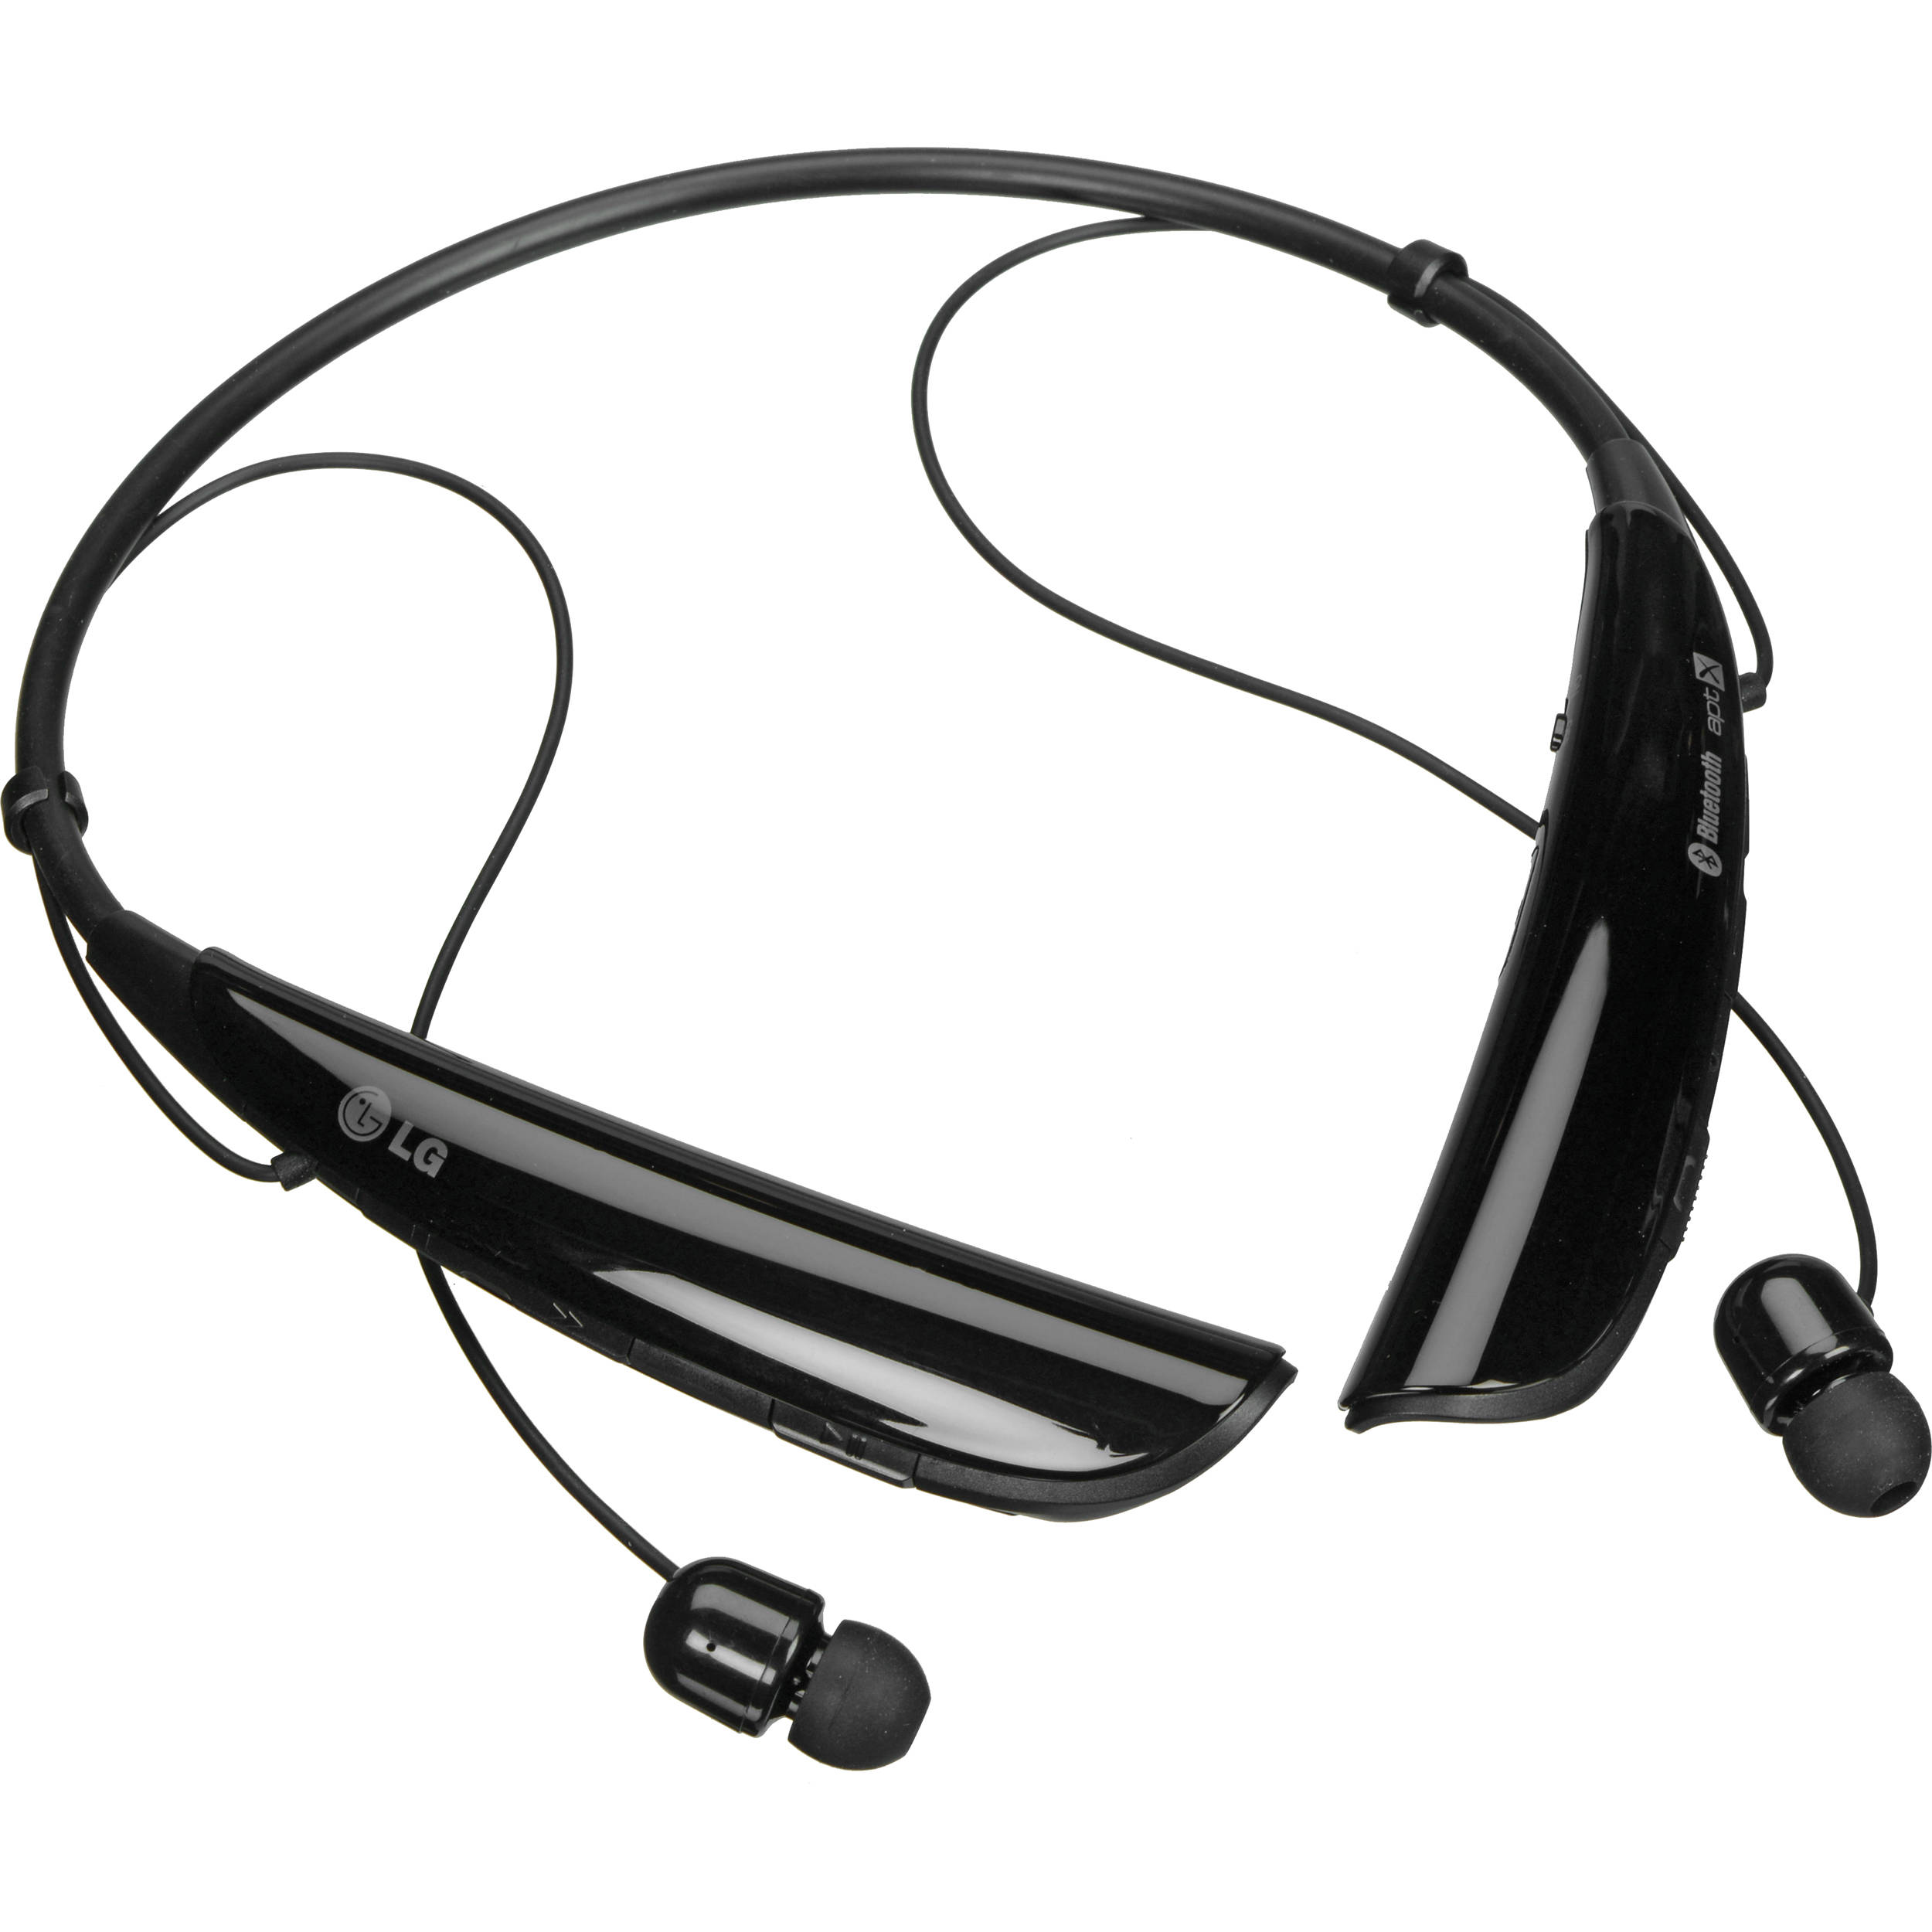 Lg pro bluetooth headset